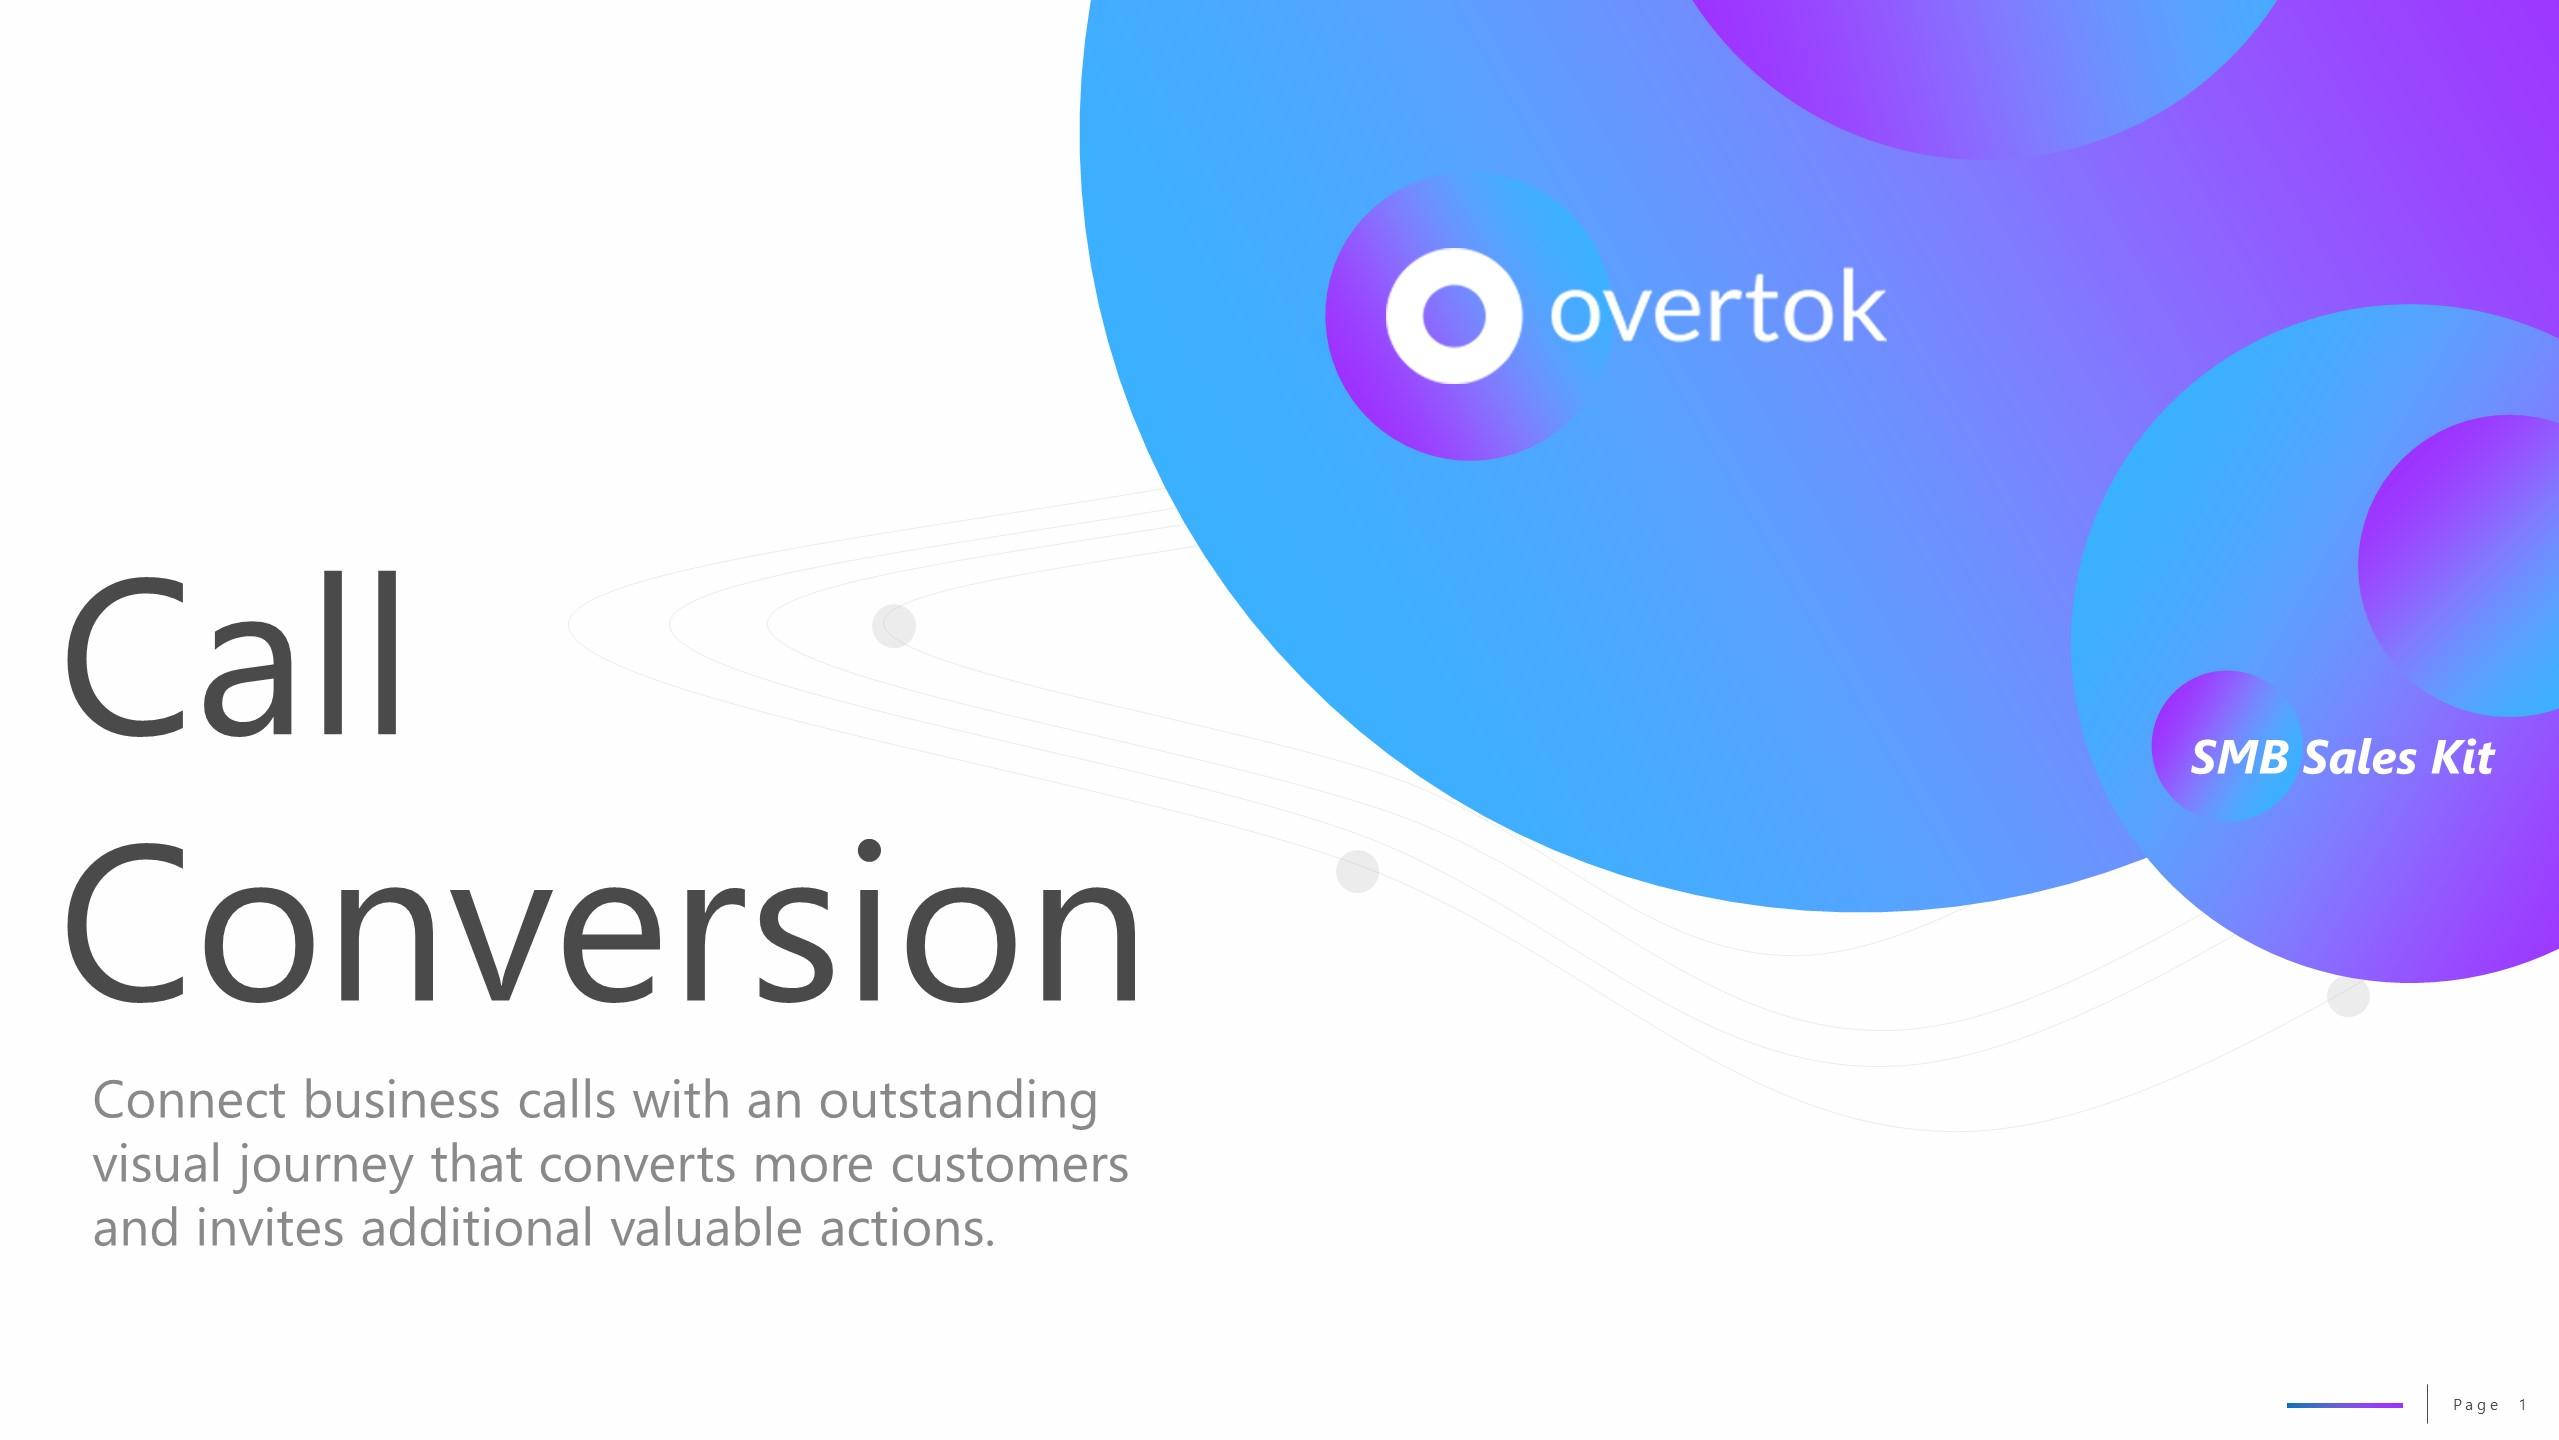 Overtok Call Conversion